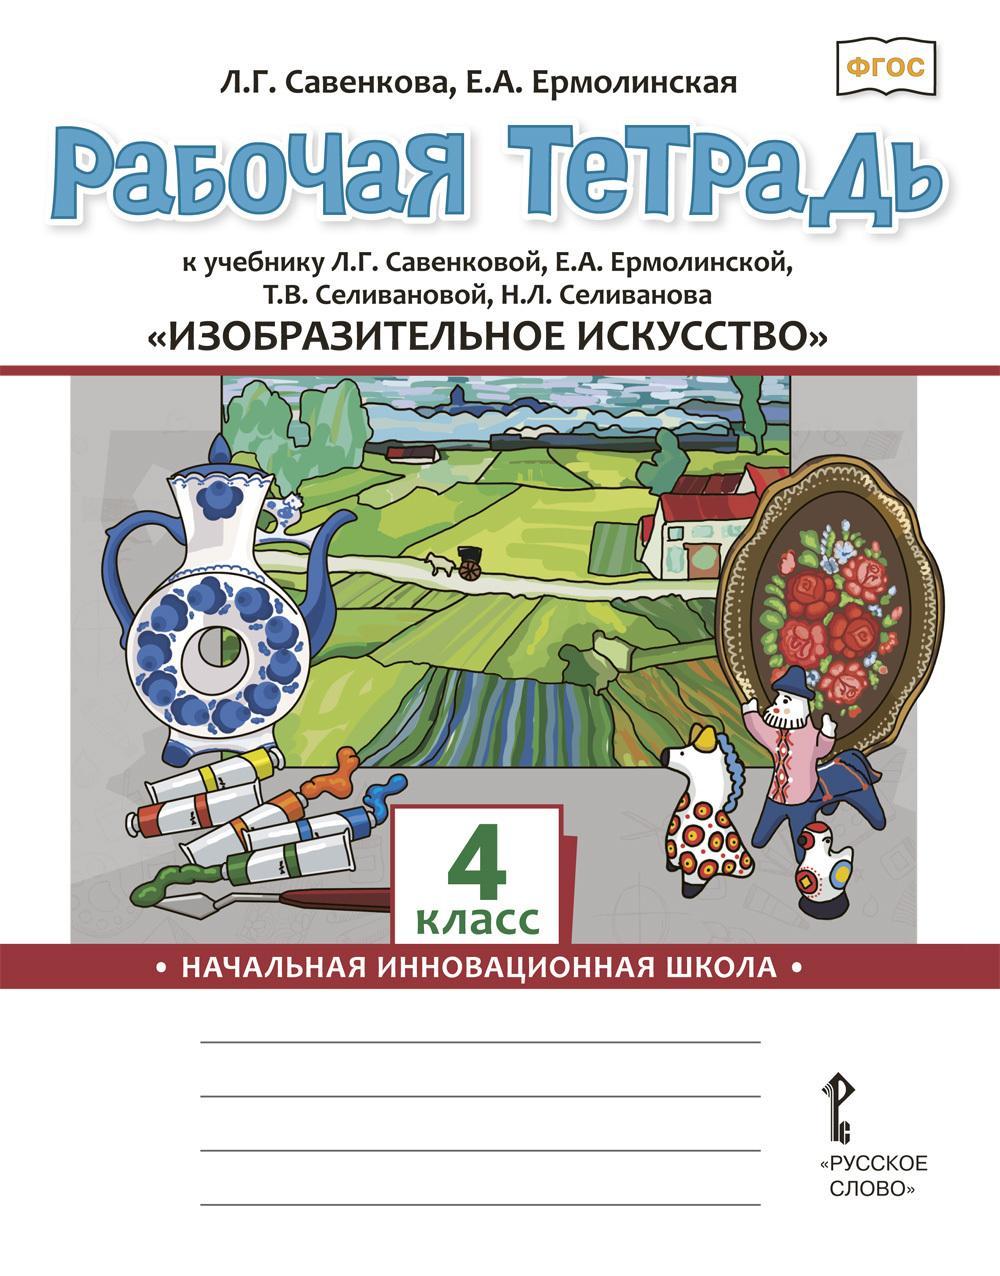 Rabochaja tetrad k uchebniku L.G. Savenkovoj, E.A. Ermolinskoj, T.V. Selivanovoj, N.L. Selivanova